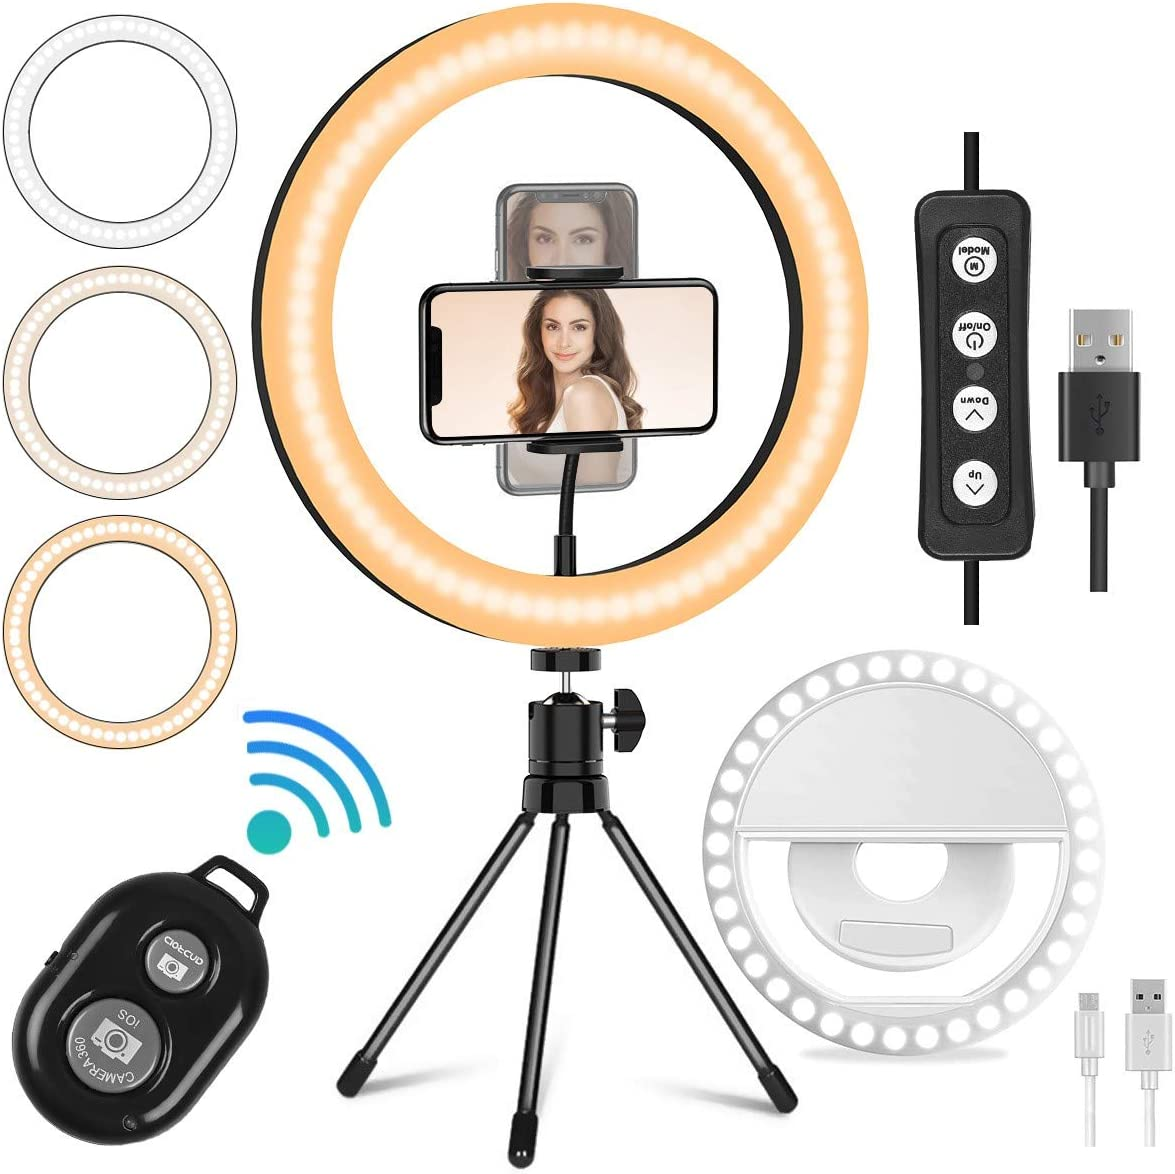 Mansso 10 LED Ring Light Set Rechargeable Selfie Ring Light Clip /& Remote Shutter /& Desktop Tripod Stand /& Phone Holder for Live Stream//Makeup//YouTube with 3 Light Modes /& 10 Brightness Level